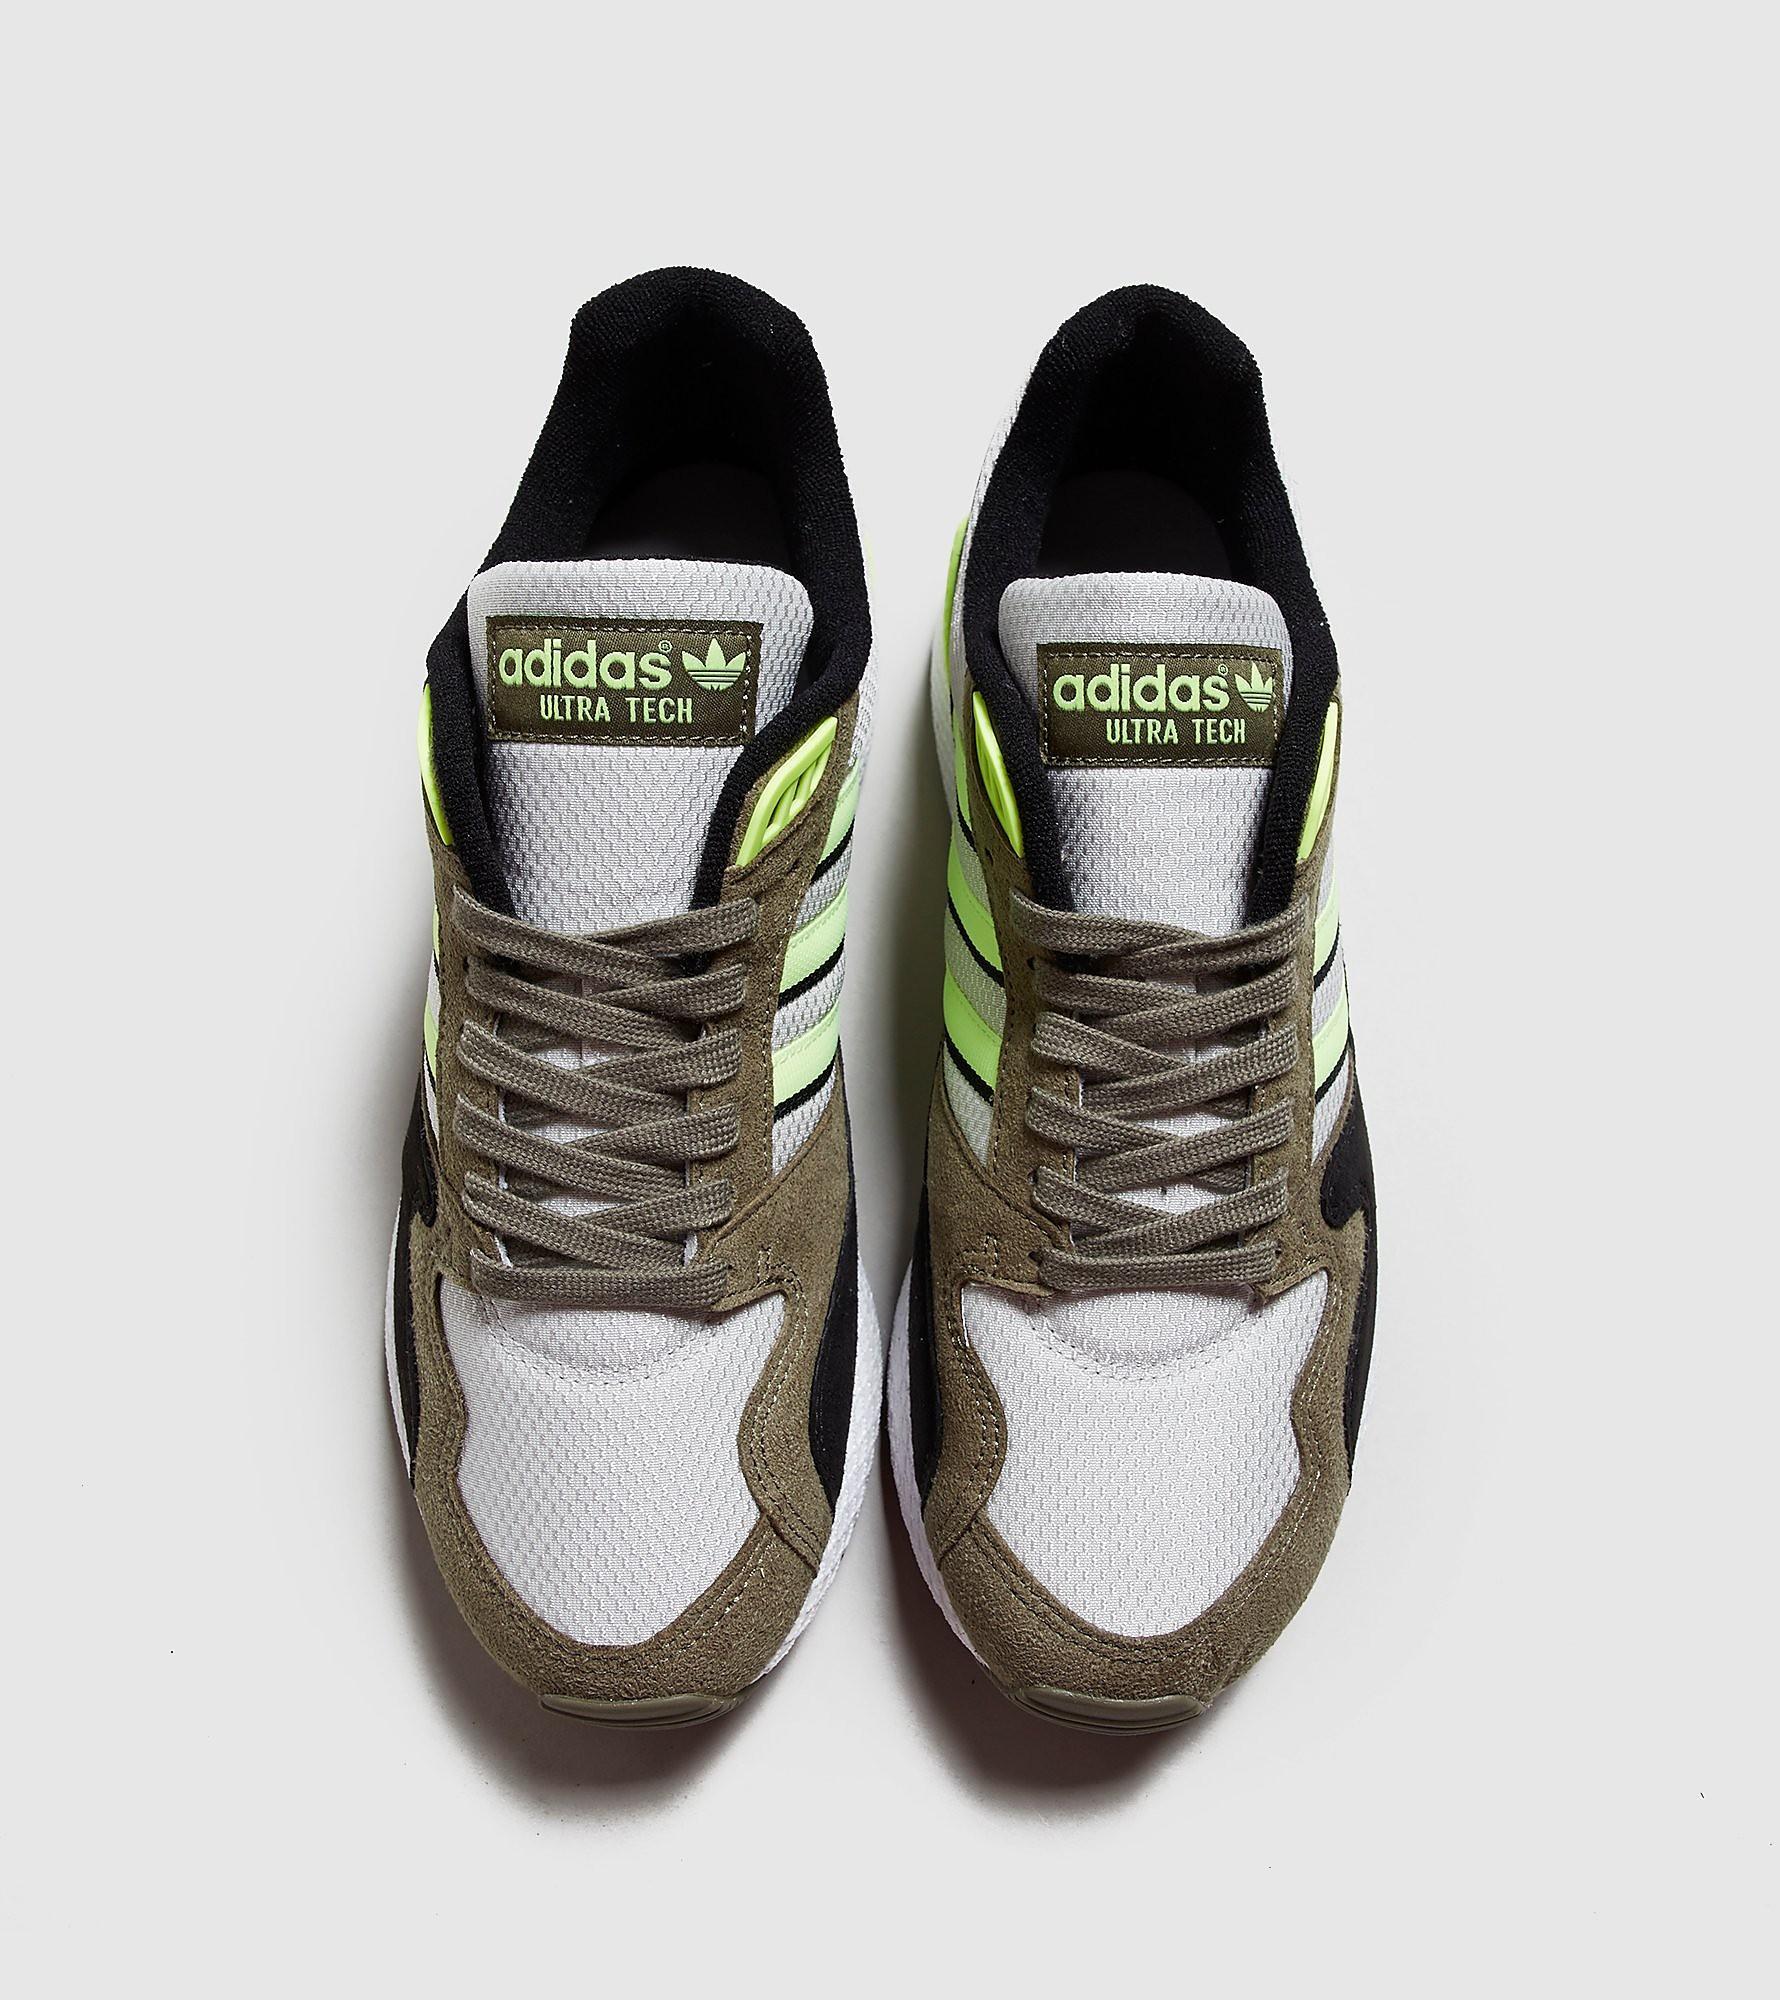 Adidas Ultra Tech Raw White/ Hi-Res Yellow/ Raw Khaki adidas Originals de hombre